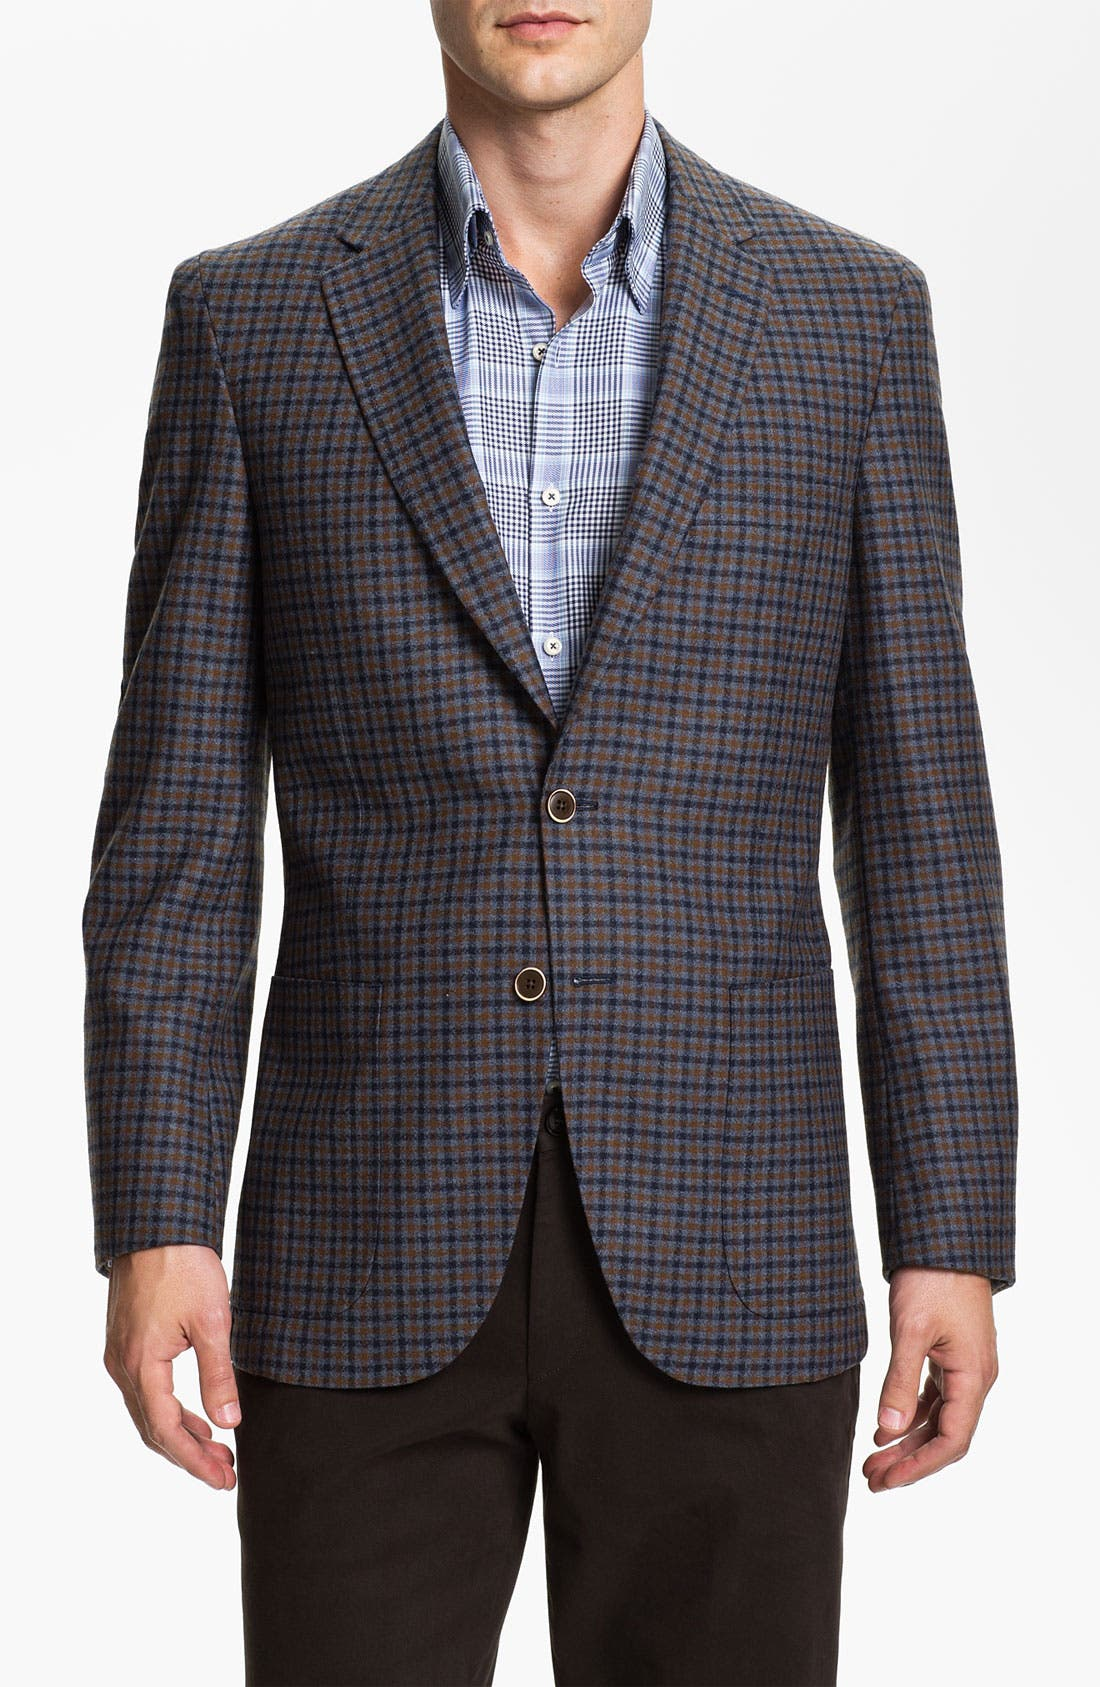 Main Image - Peter Millar Wool & Cashmere Sportcoat